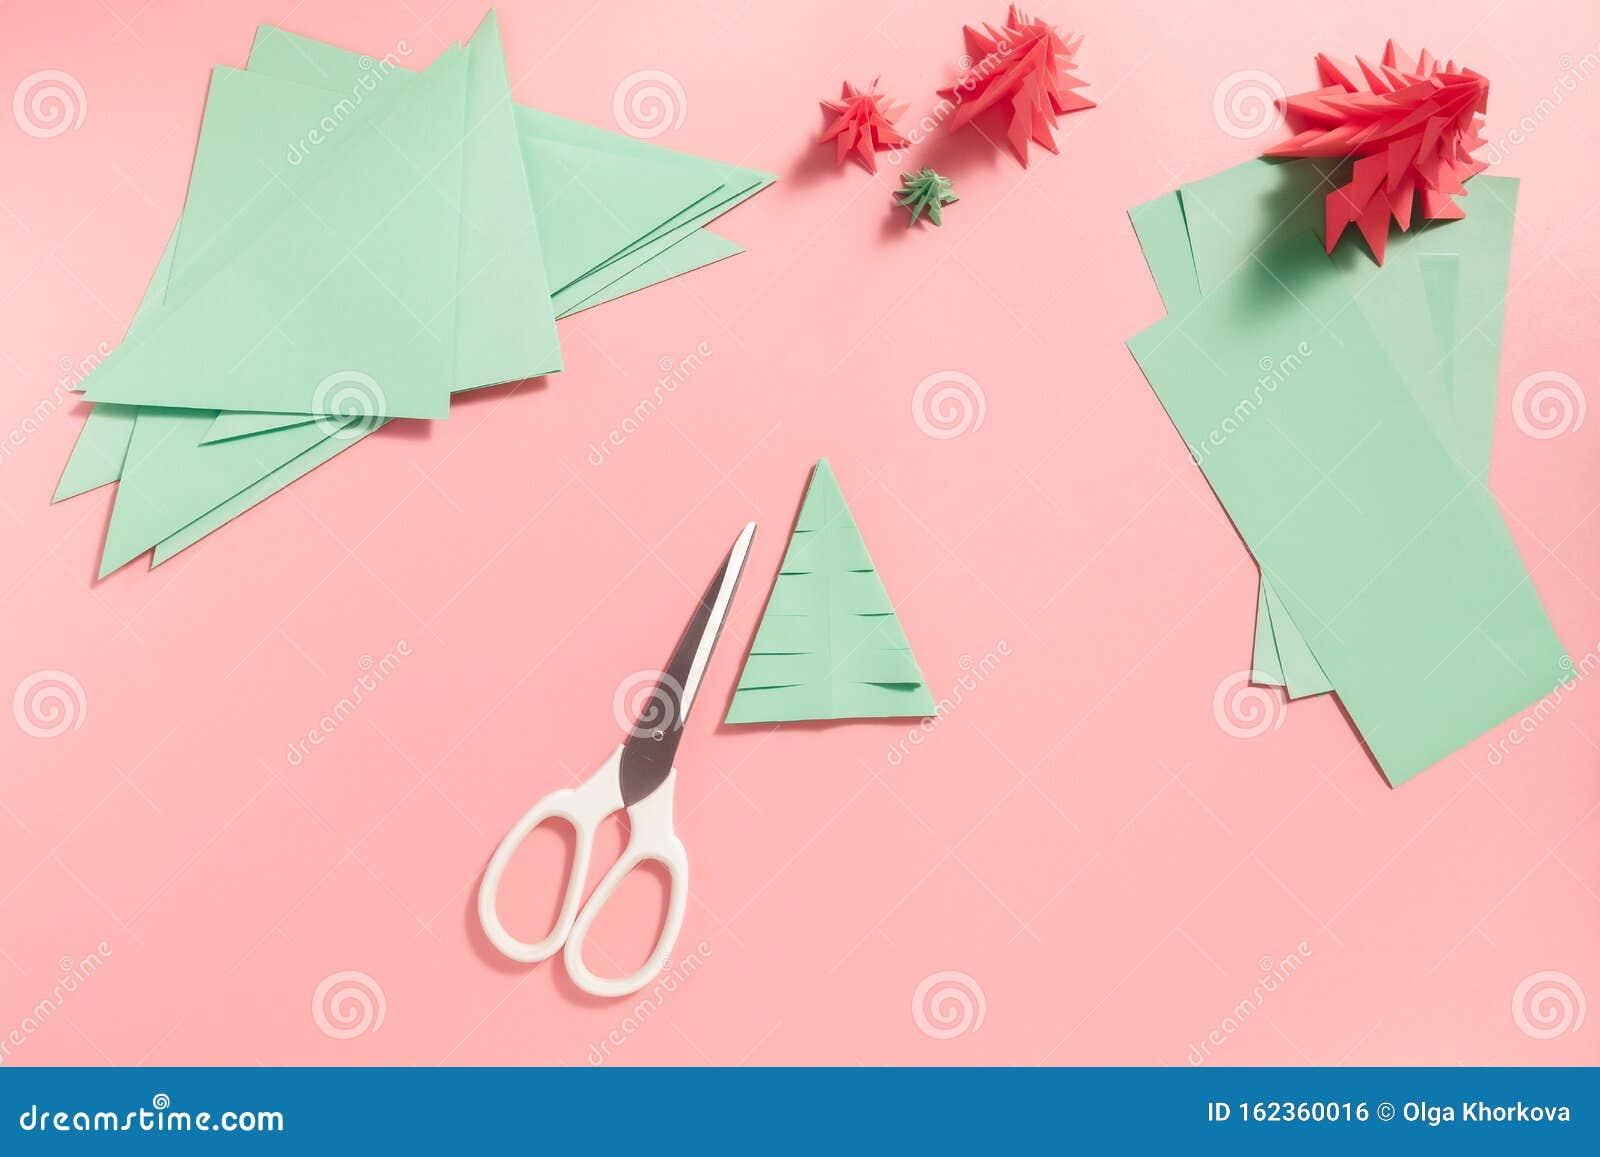 HOW TO MAKE 3D ORIGAMI CHRISTMAS TREE |PAPER CHRISTMAS TREE ... | 1155x1600